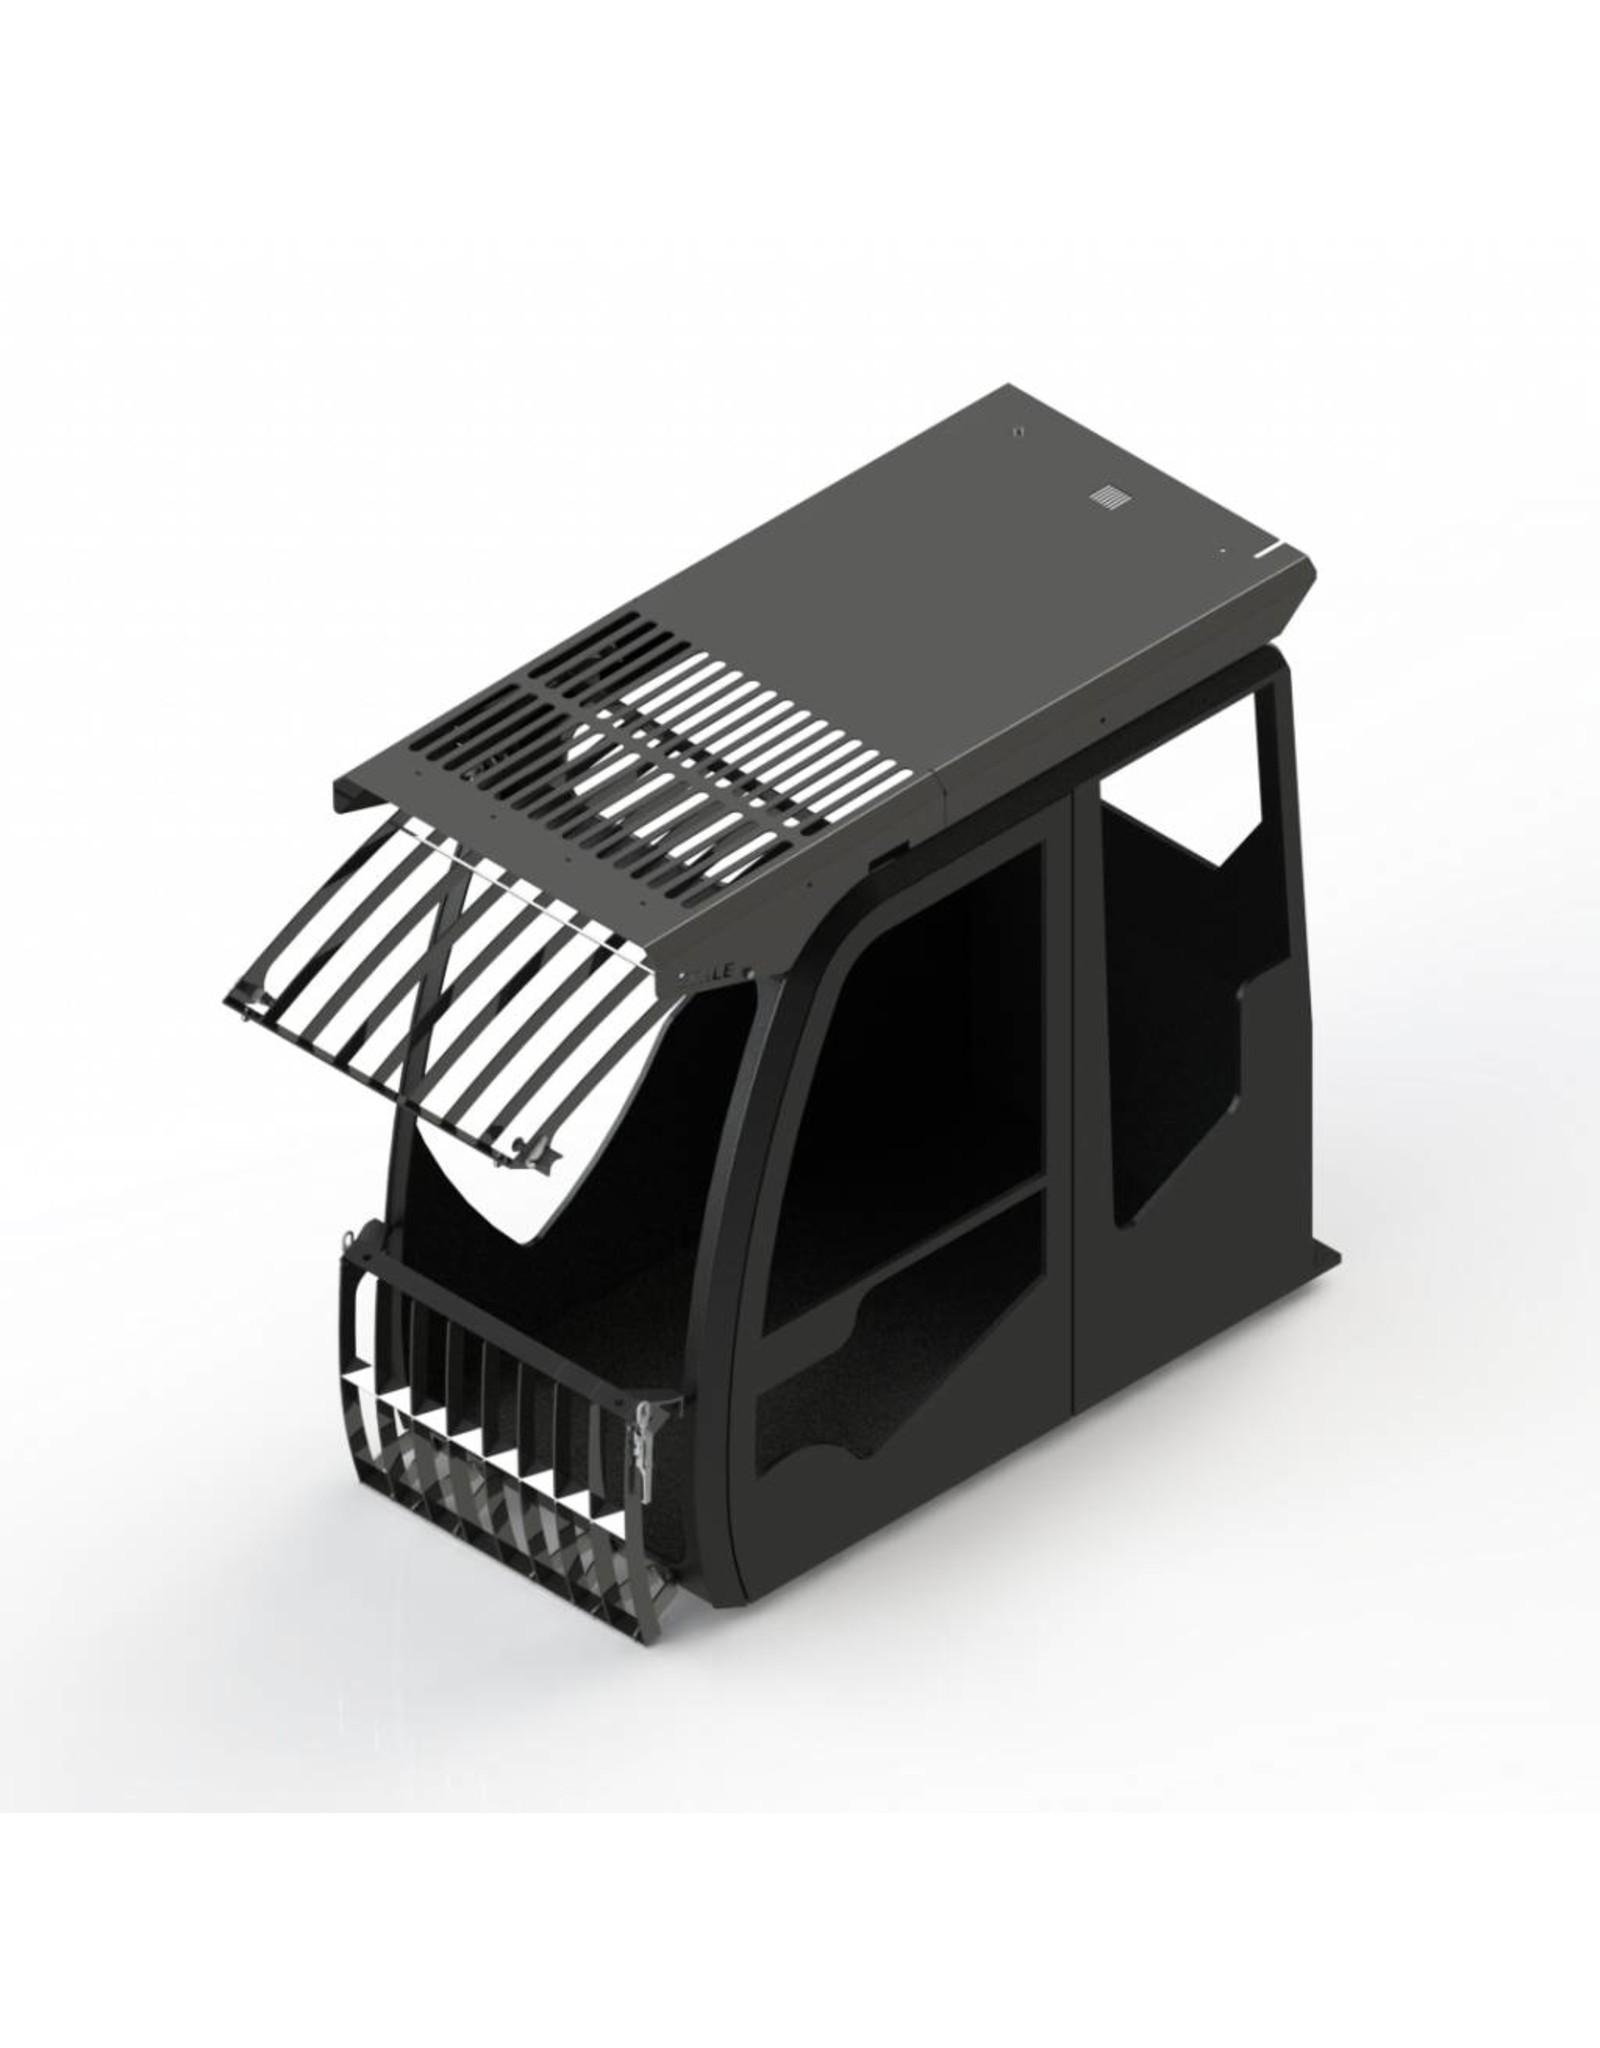 Echle Hartstahl GmbH FOPS für JCB JS220LC